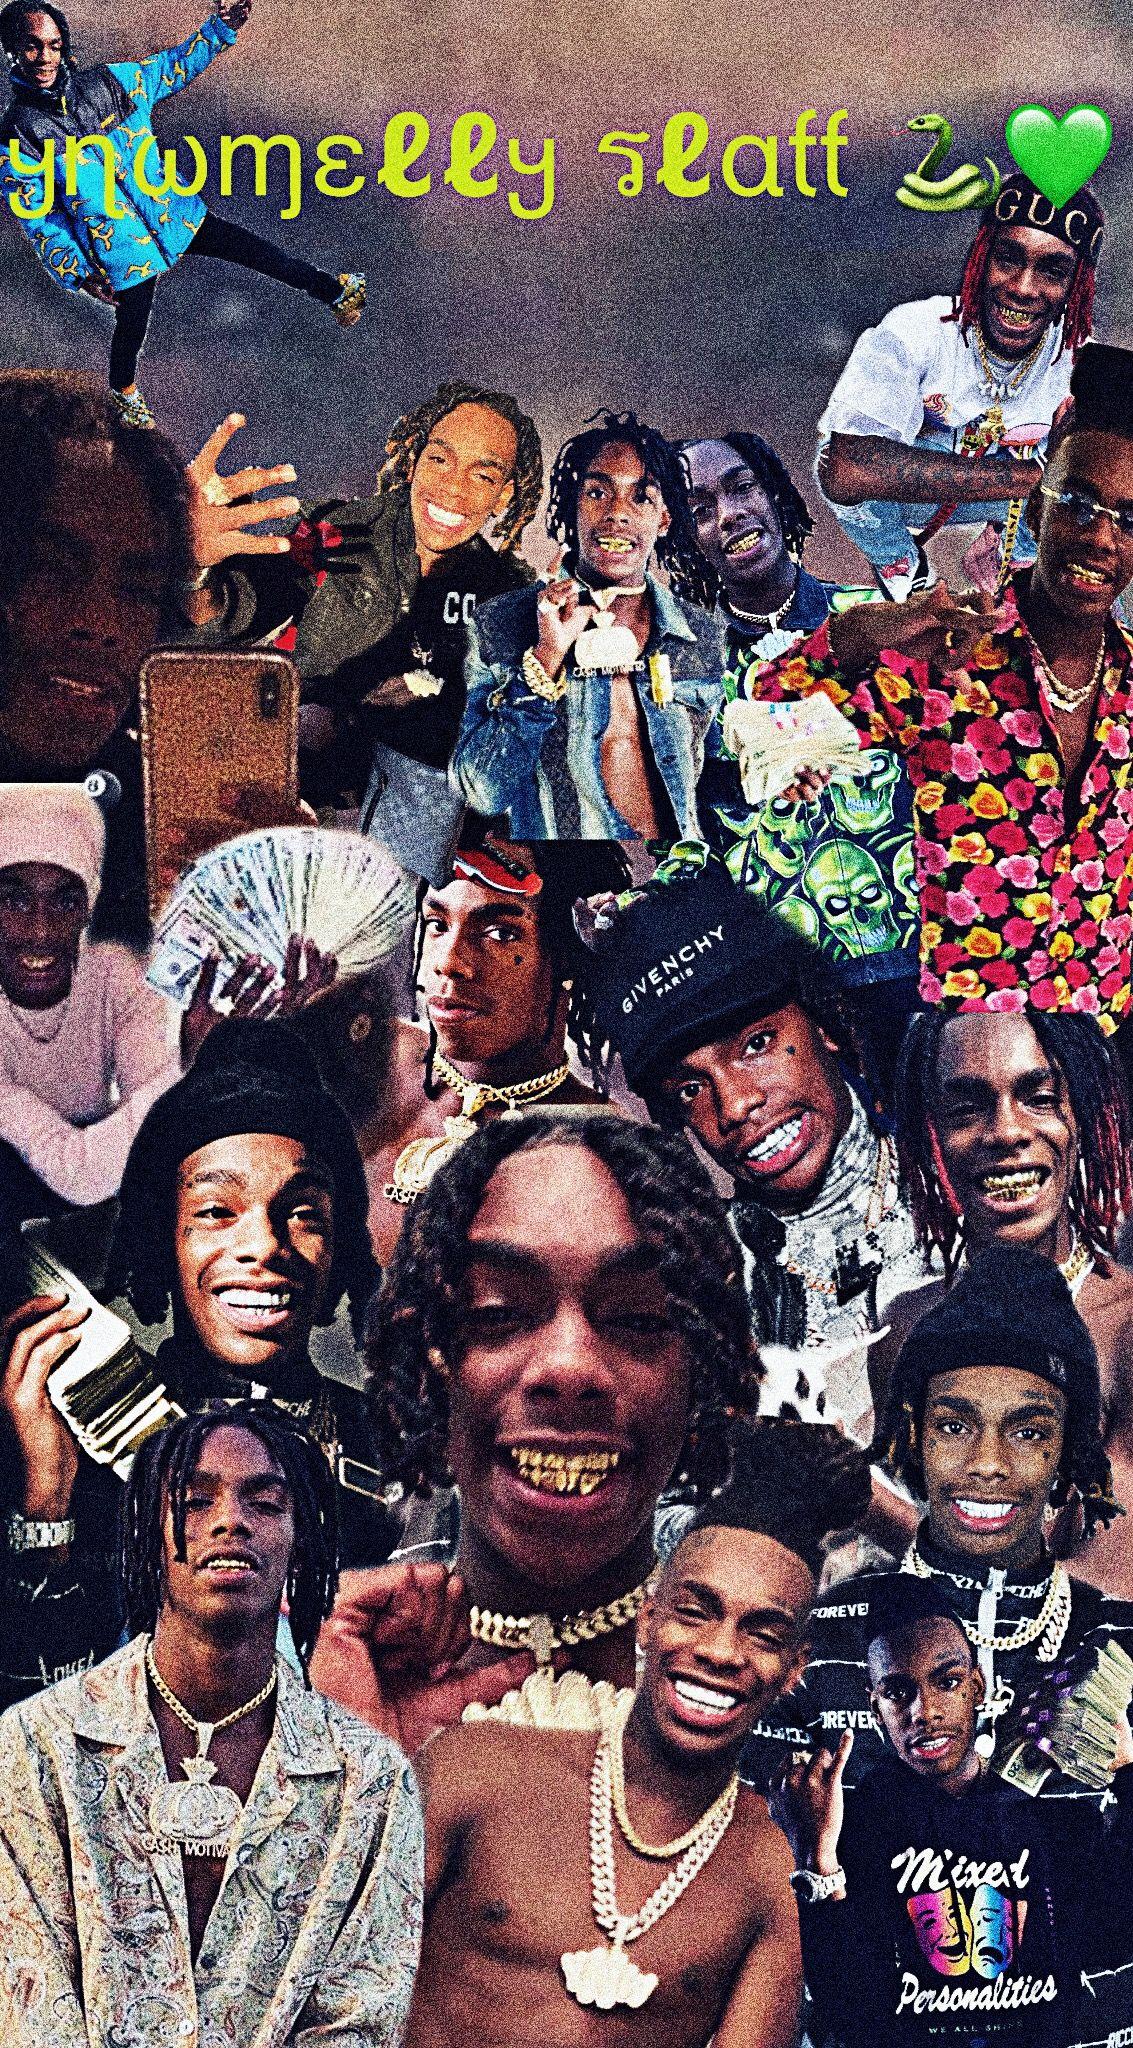 Ynw Melly Screenwallpaper I Tried Bad Girl Wallpaper Tupac Wallpaper Download Cute Wallpapers